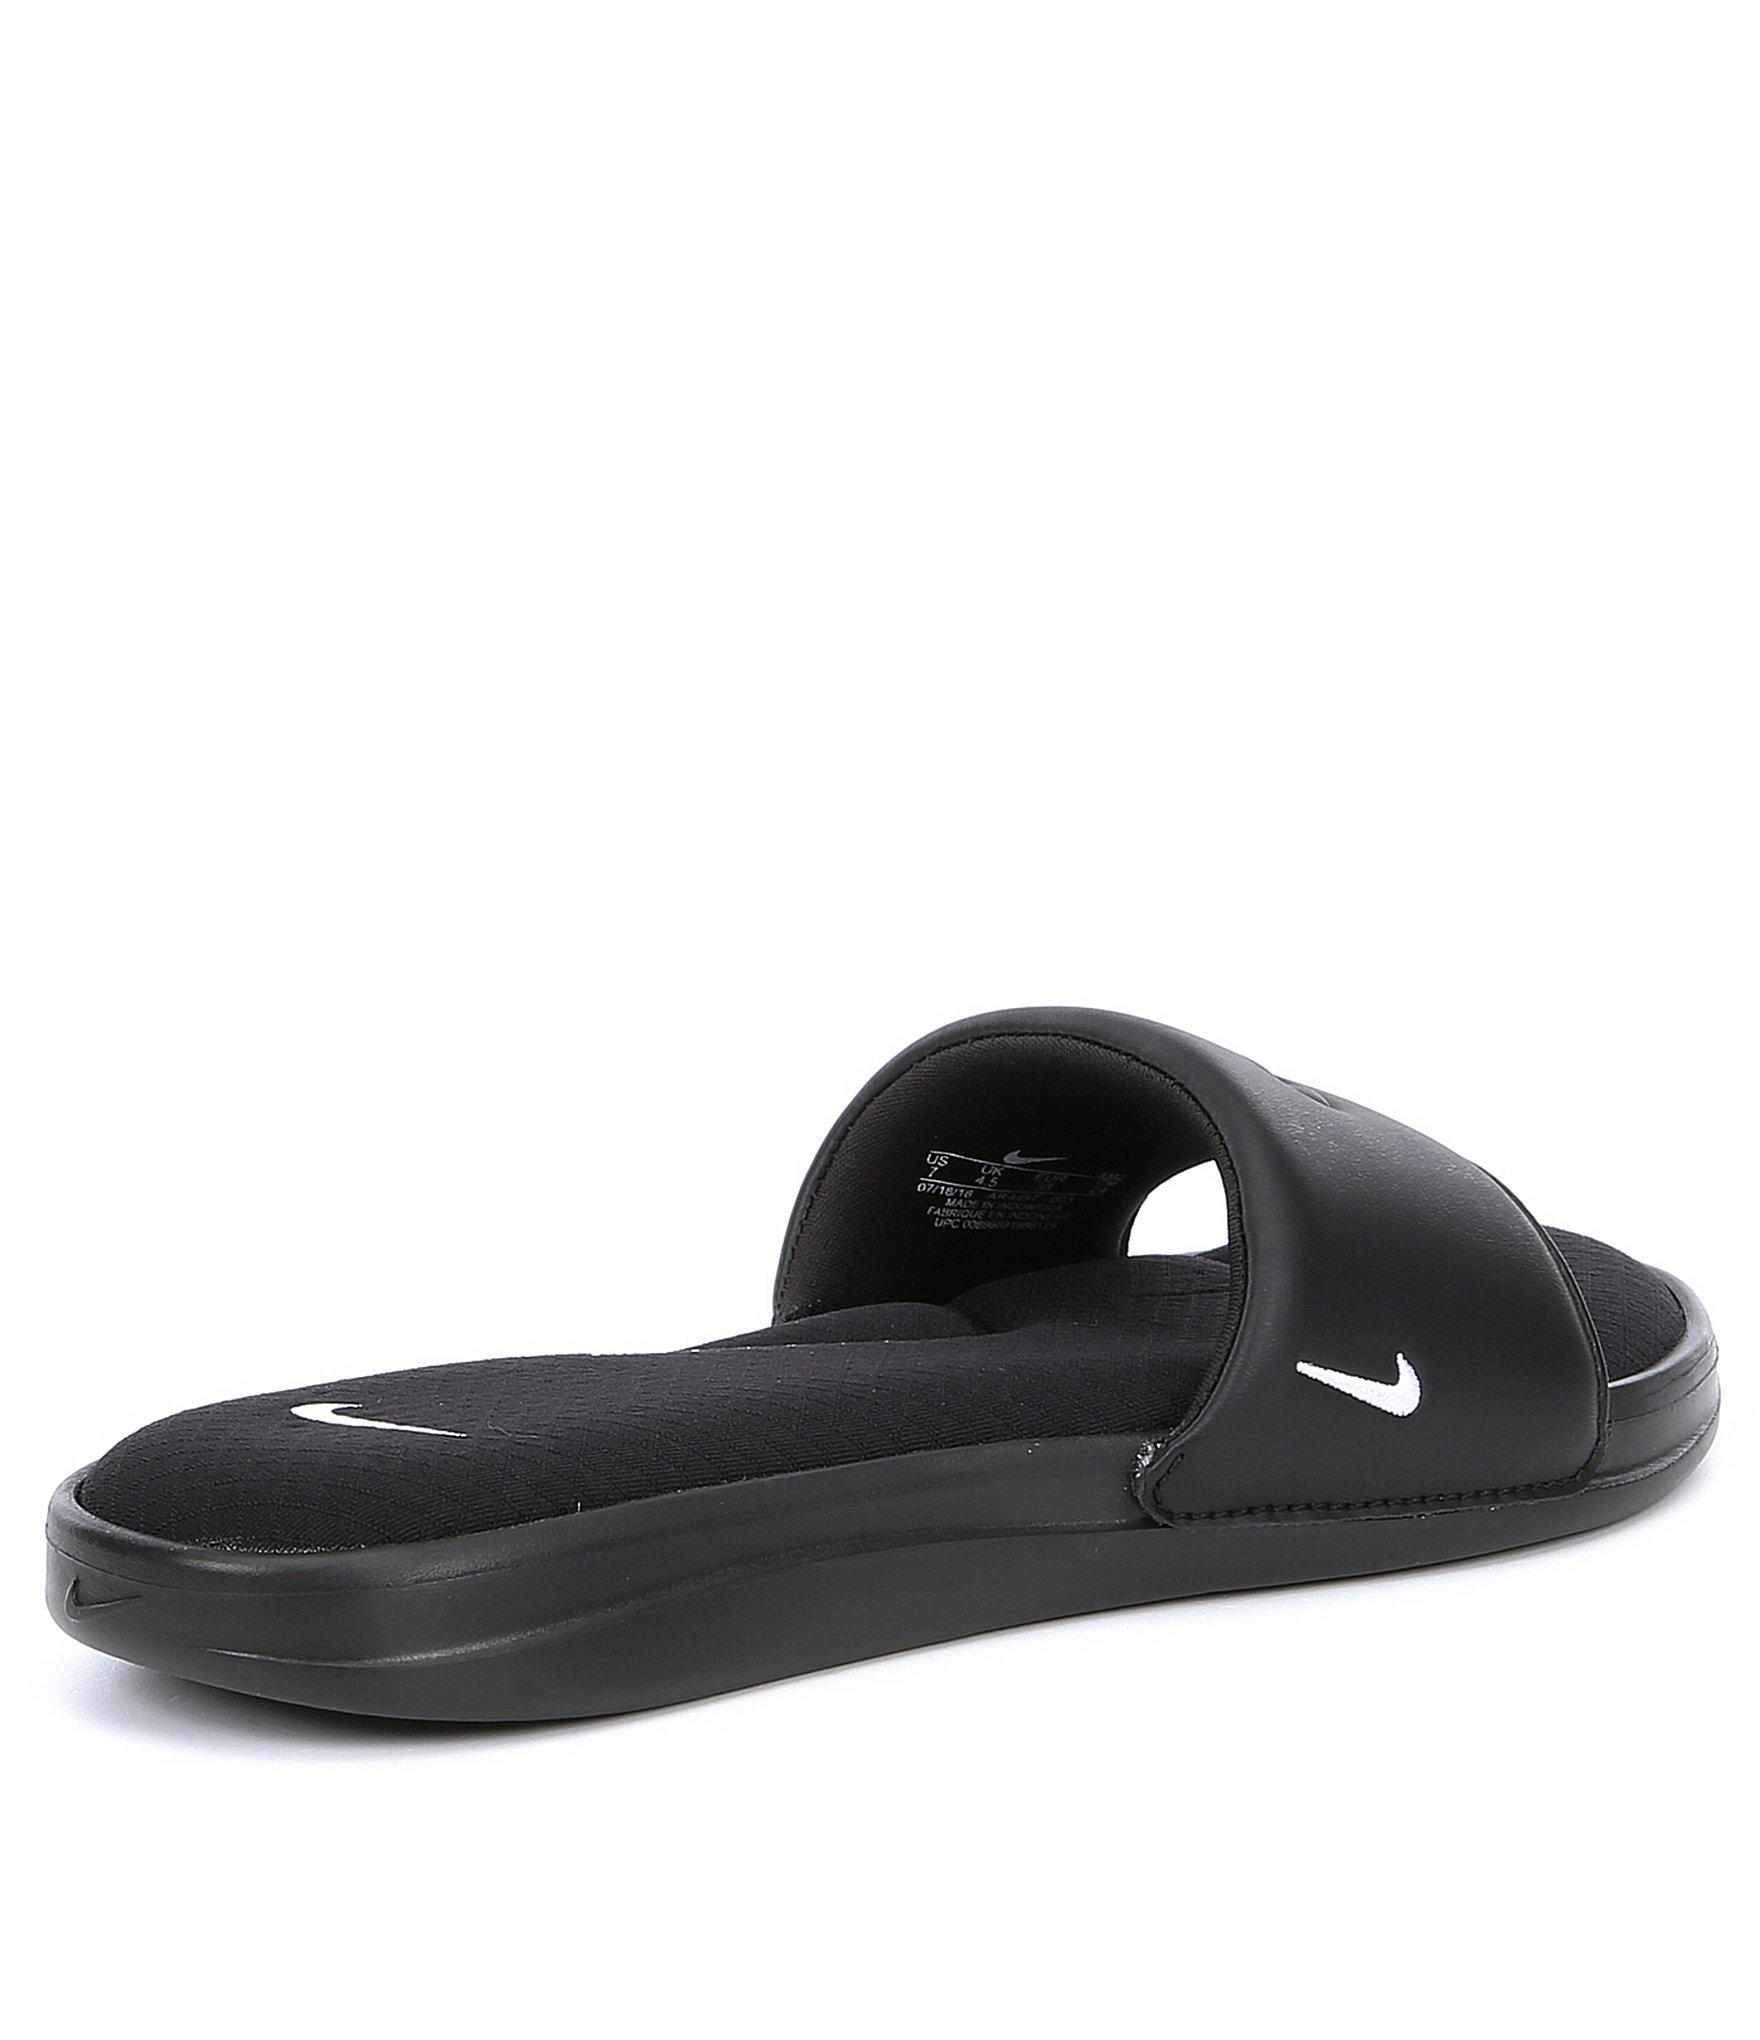 a66fb347826f Nike - Black Women s Ultra Comfort Slide - Lyst. View fullscreen